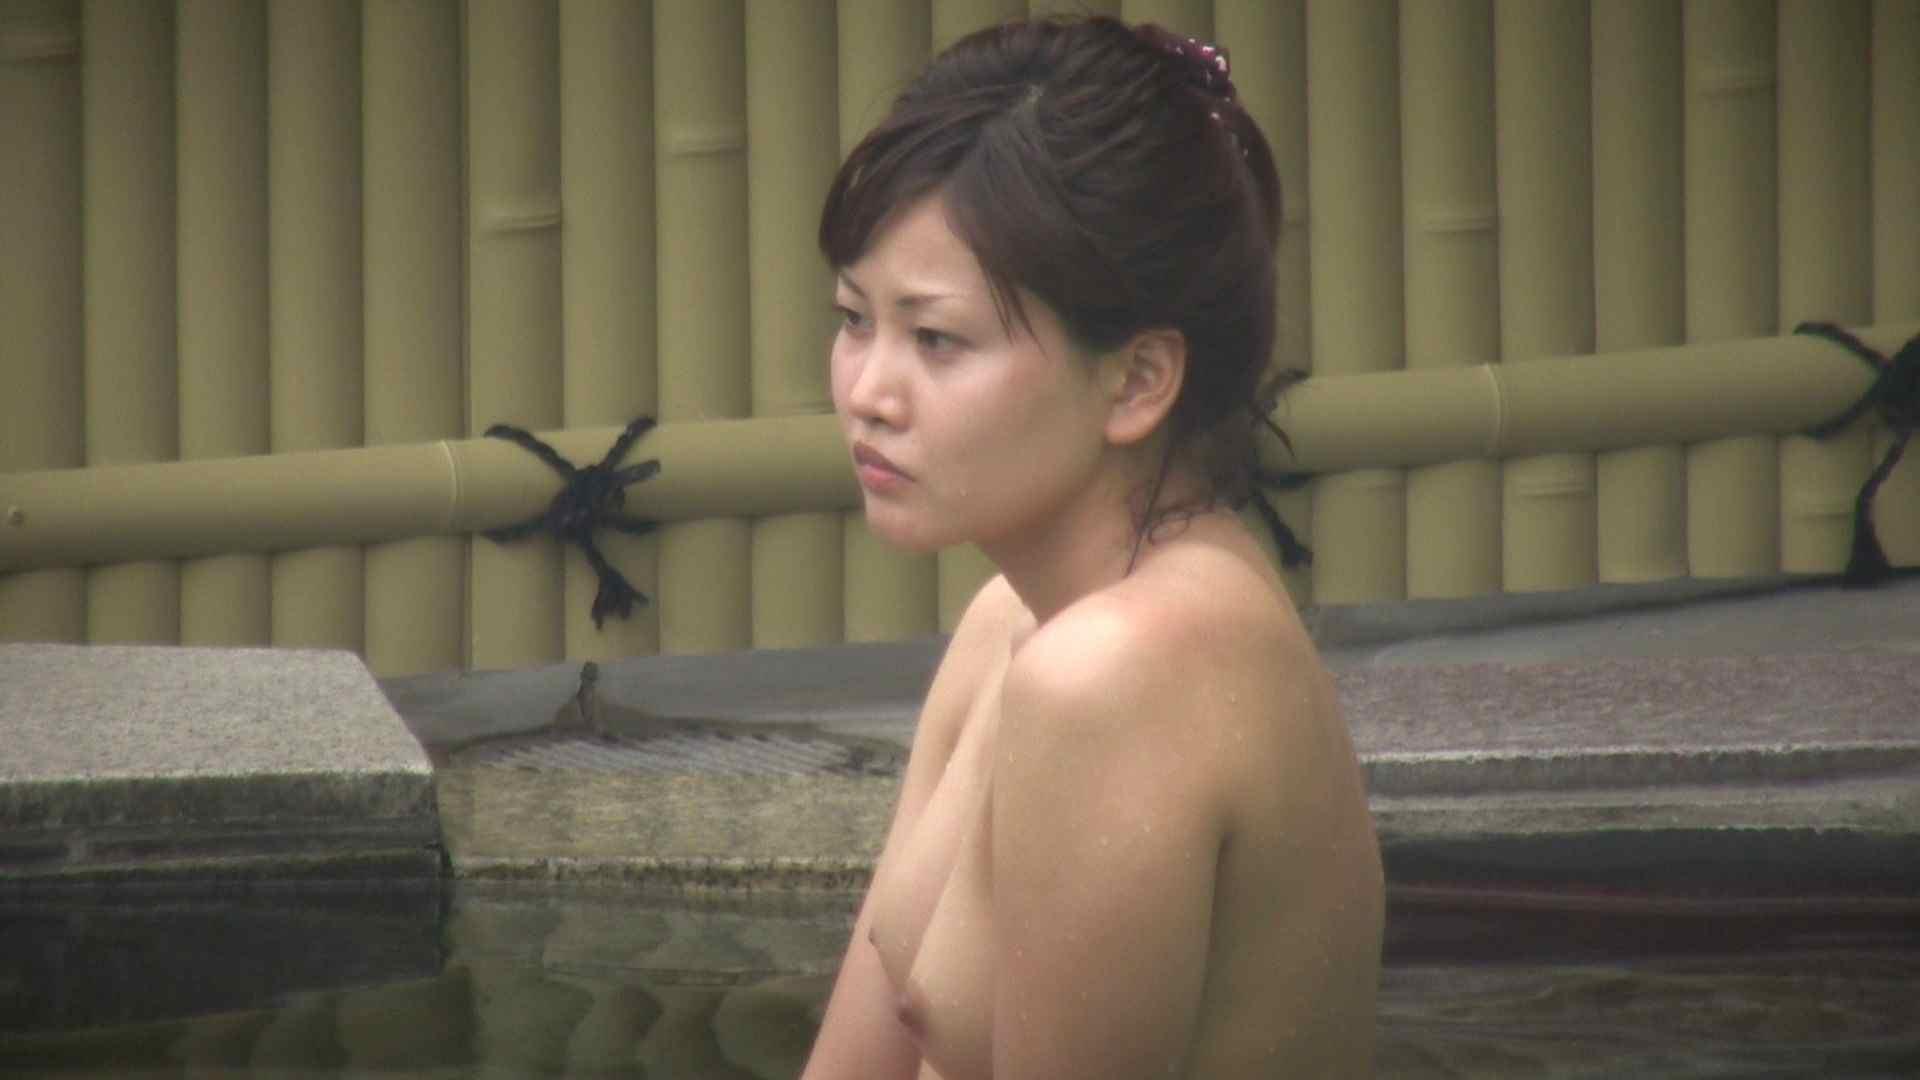 Aquaな露天風呂Vol.125 露天  88連発 62